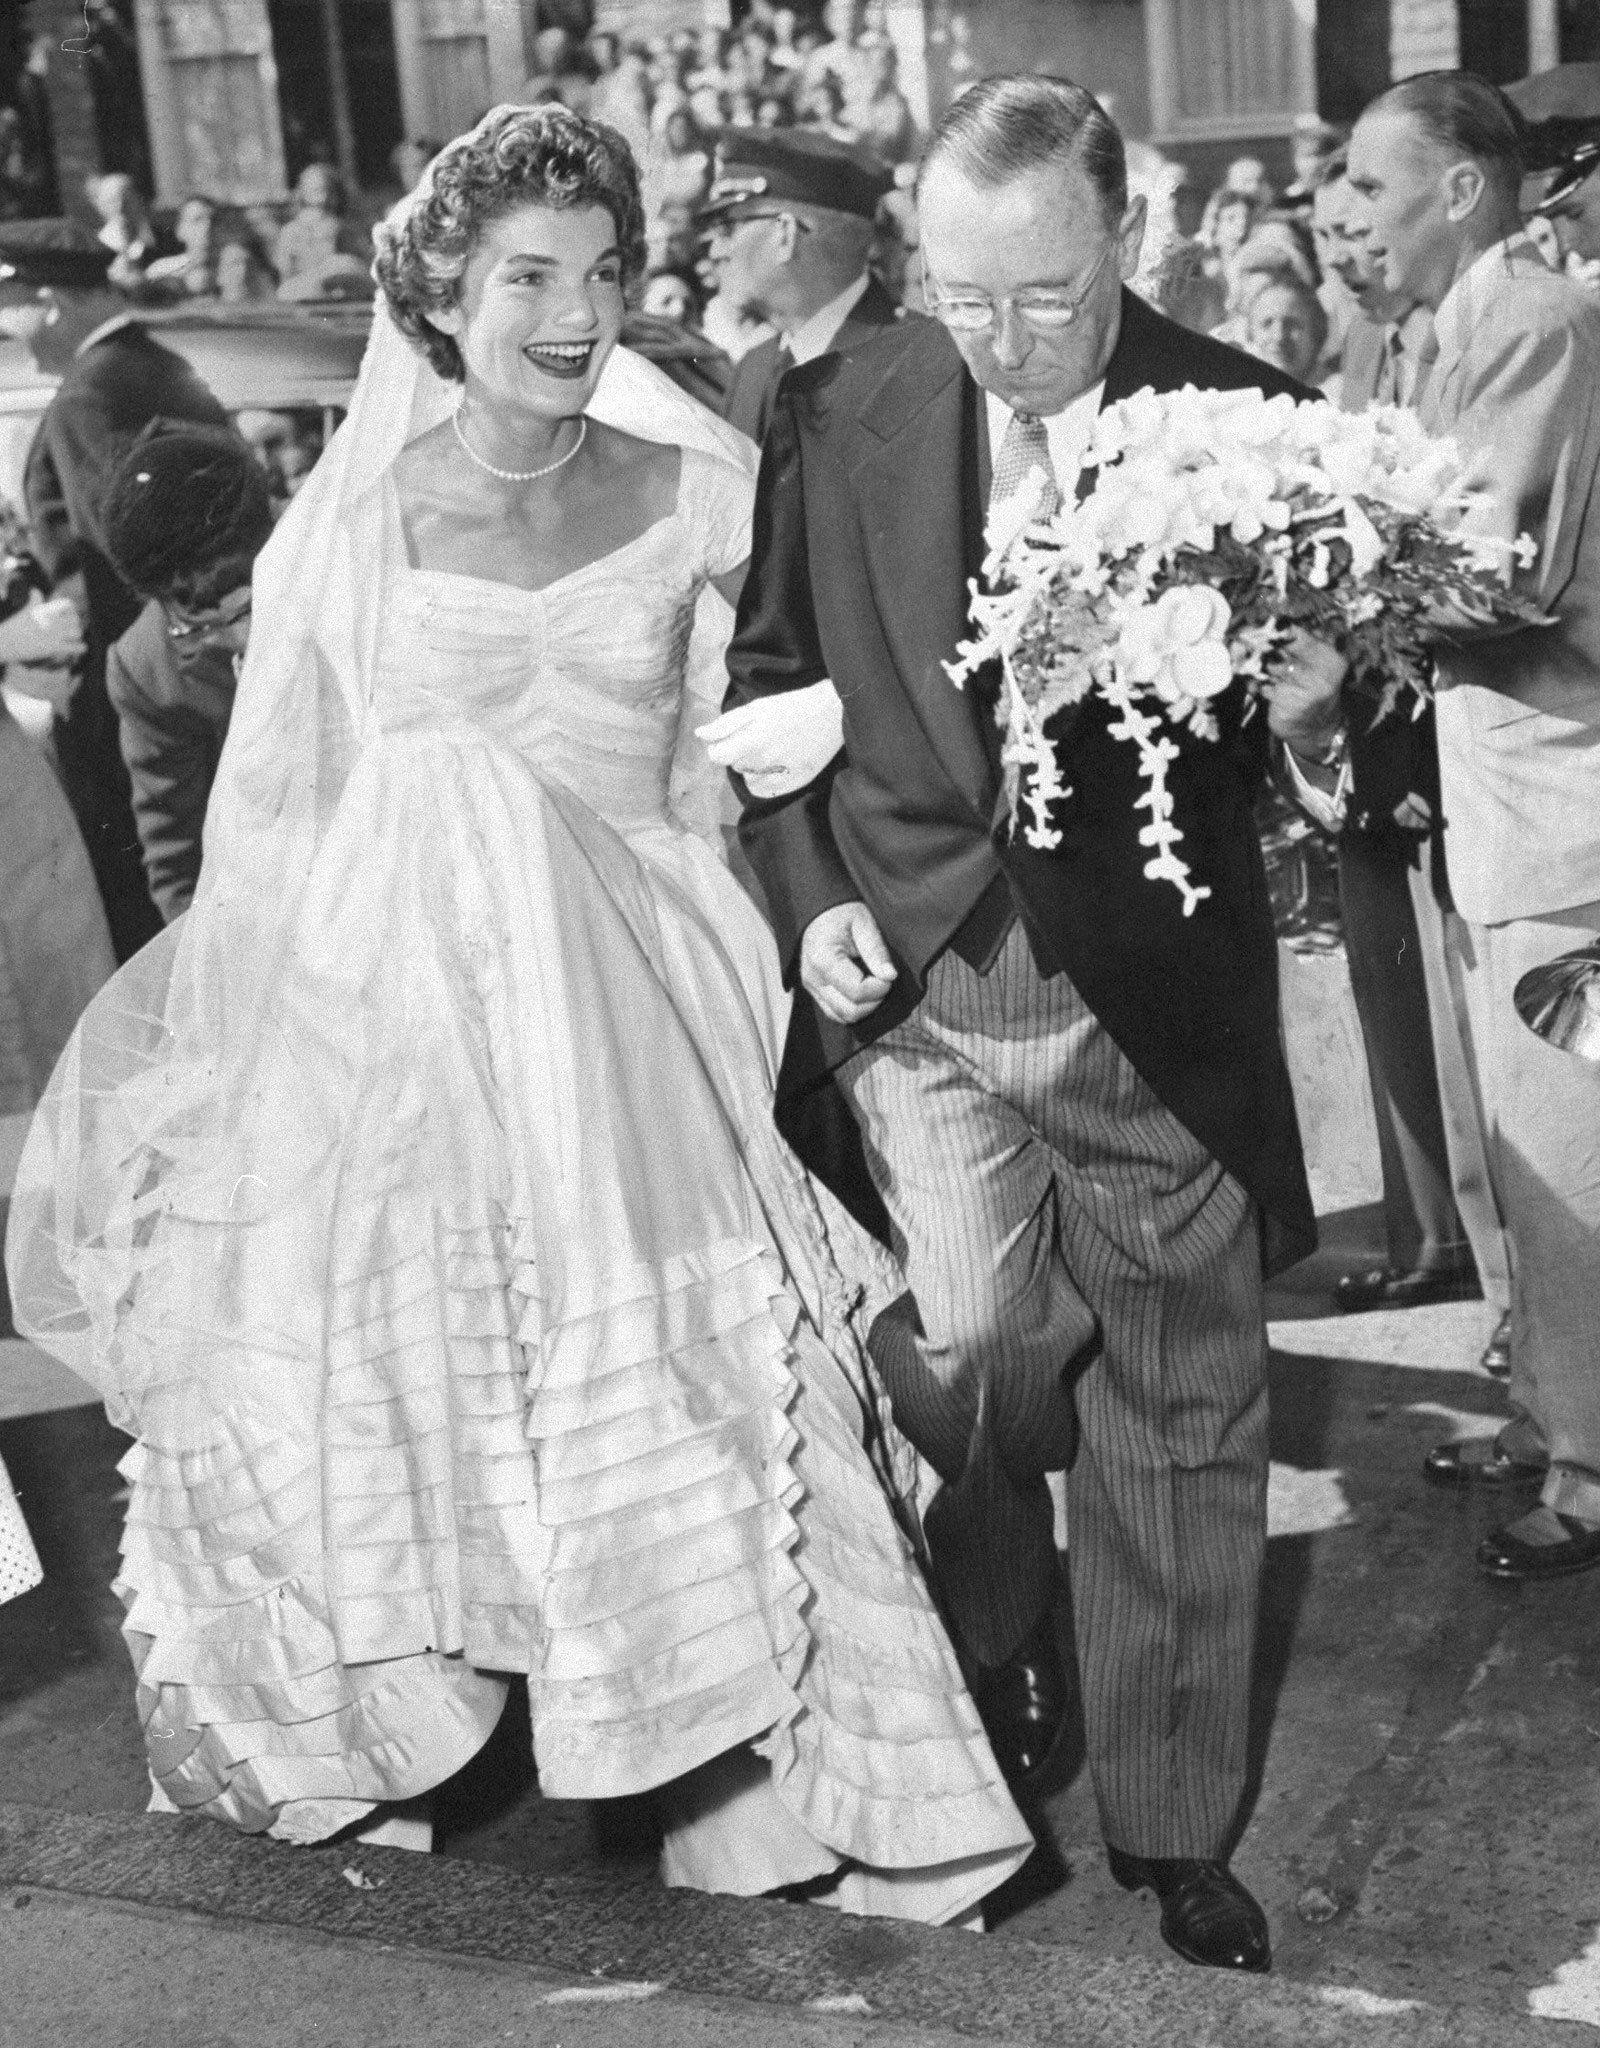 Carolyn kennedy bessette wedding dress  Jackie Kennedyus Wedding to John F Kennedy  Mere zee Dotes